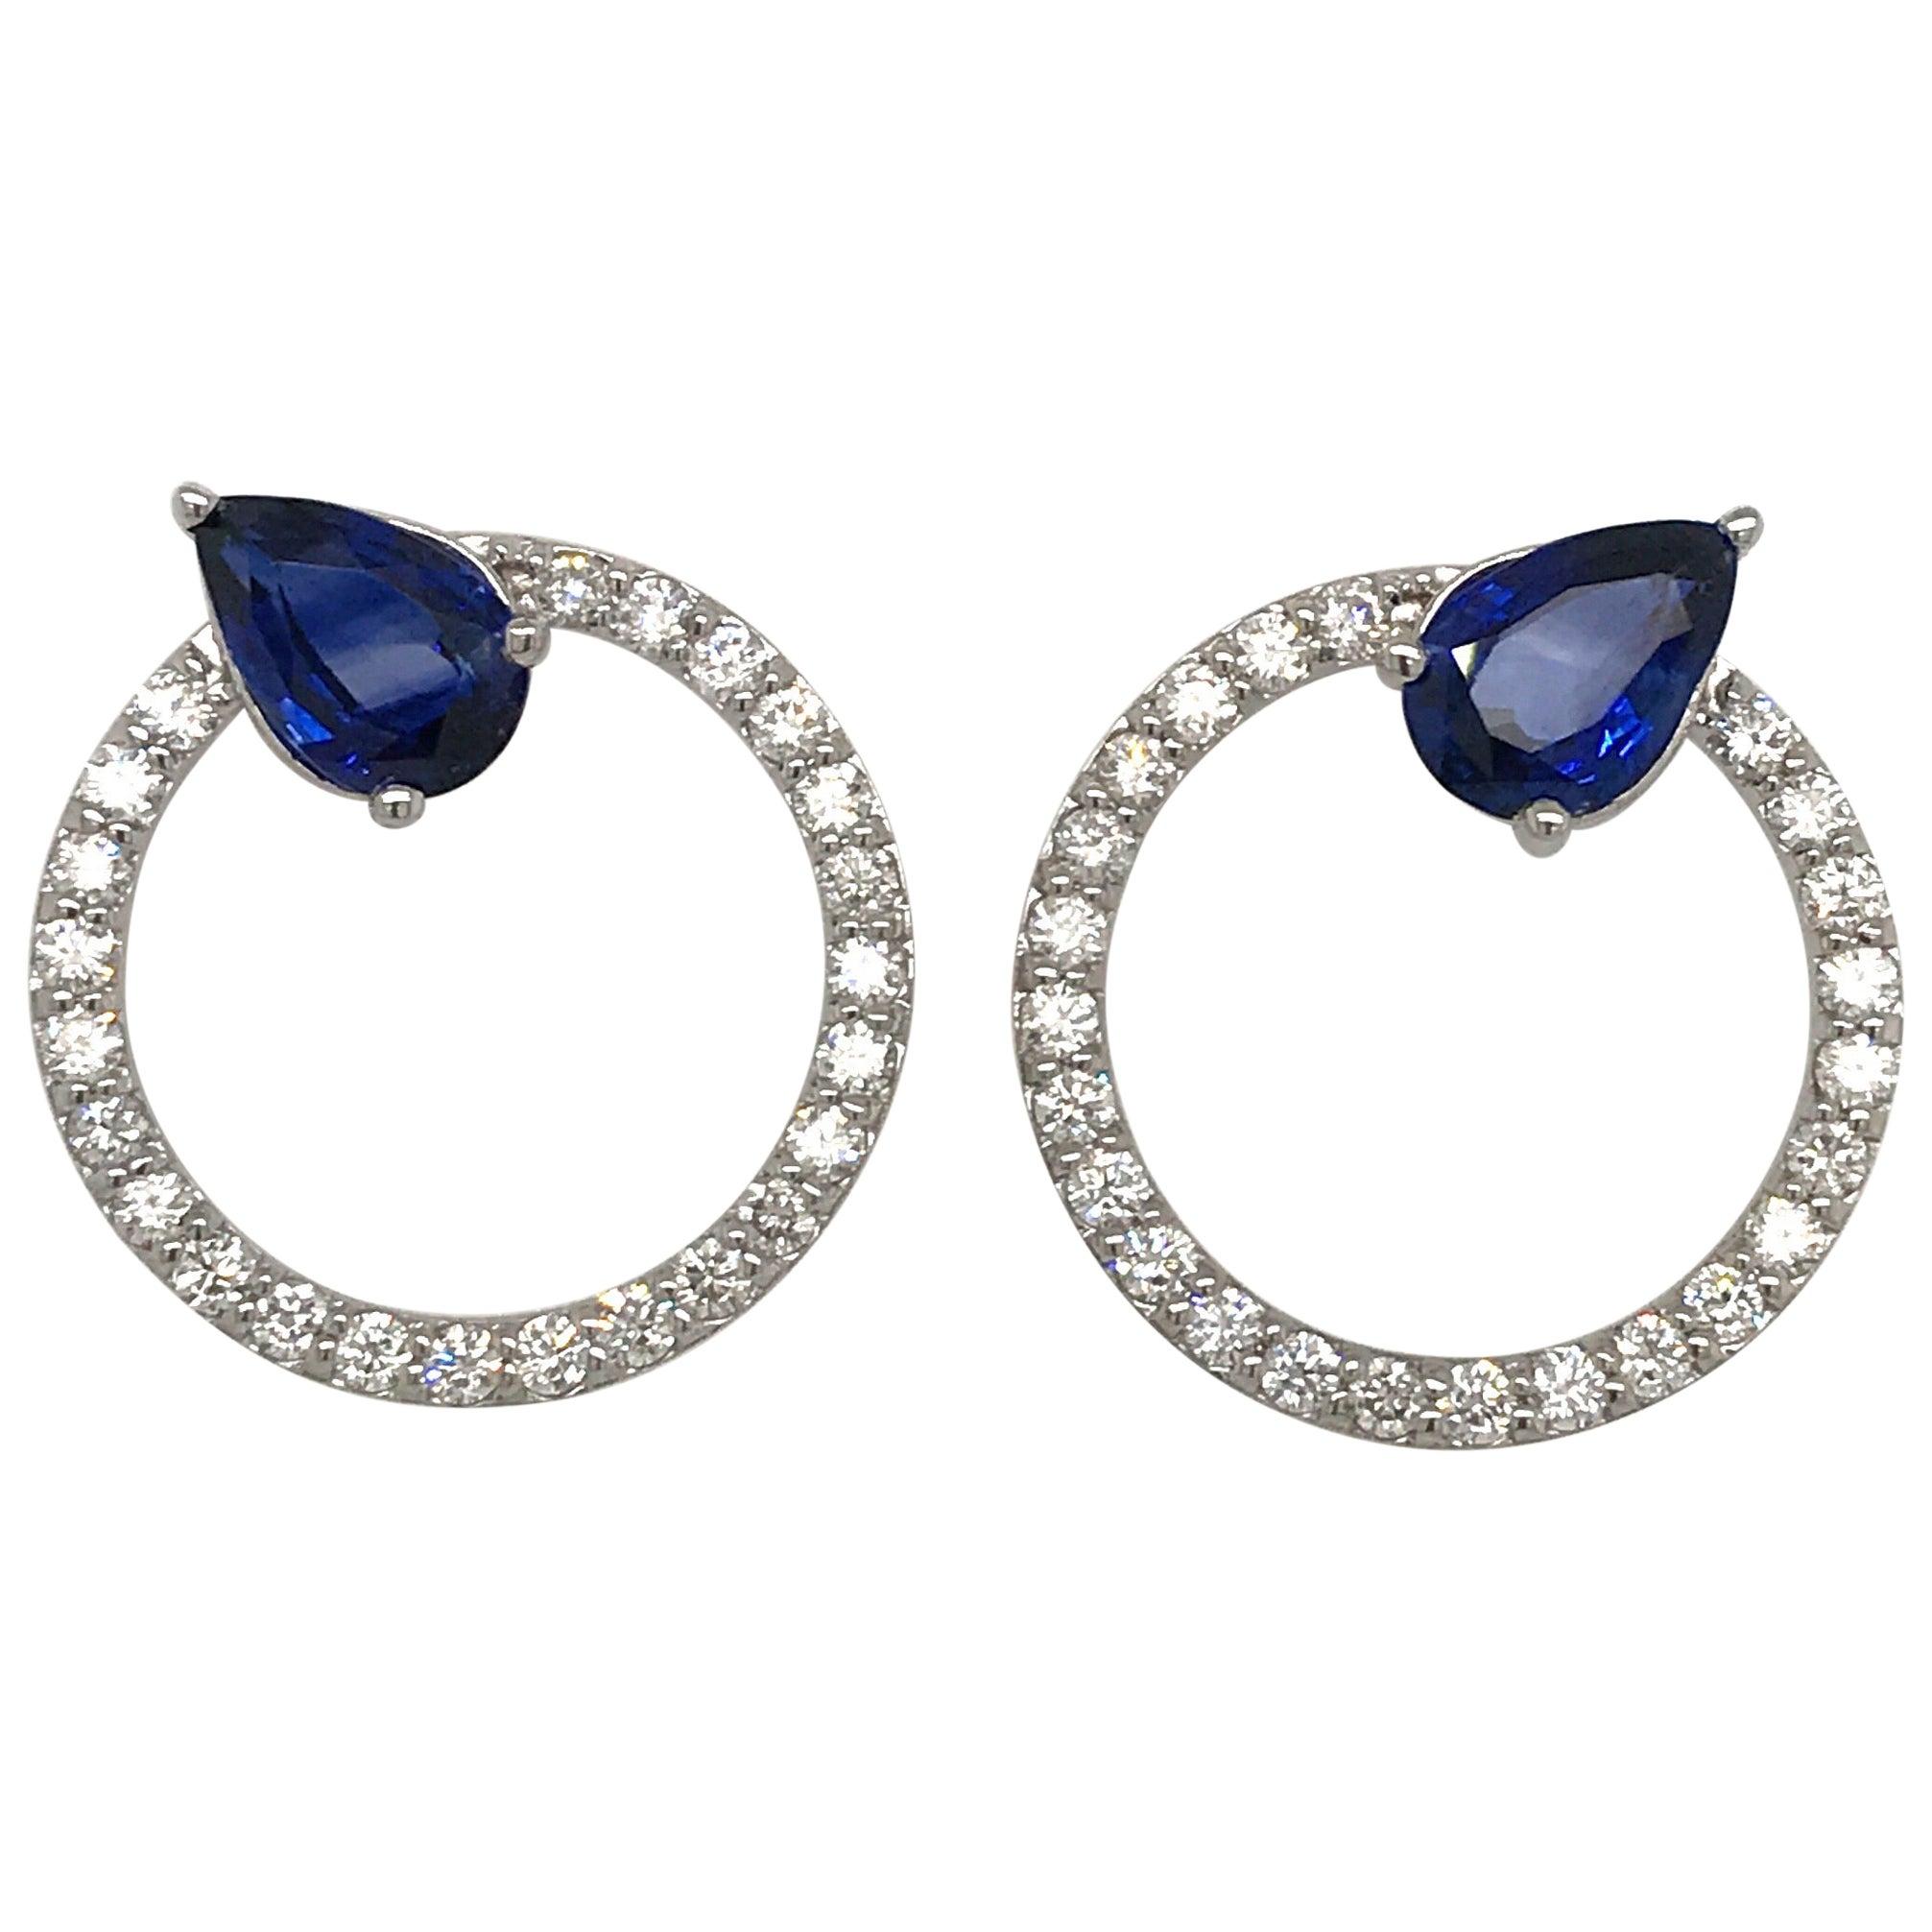 Sapphire Diamond Hoop Earrings 4.91 Carat 14 Karat White Gold